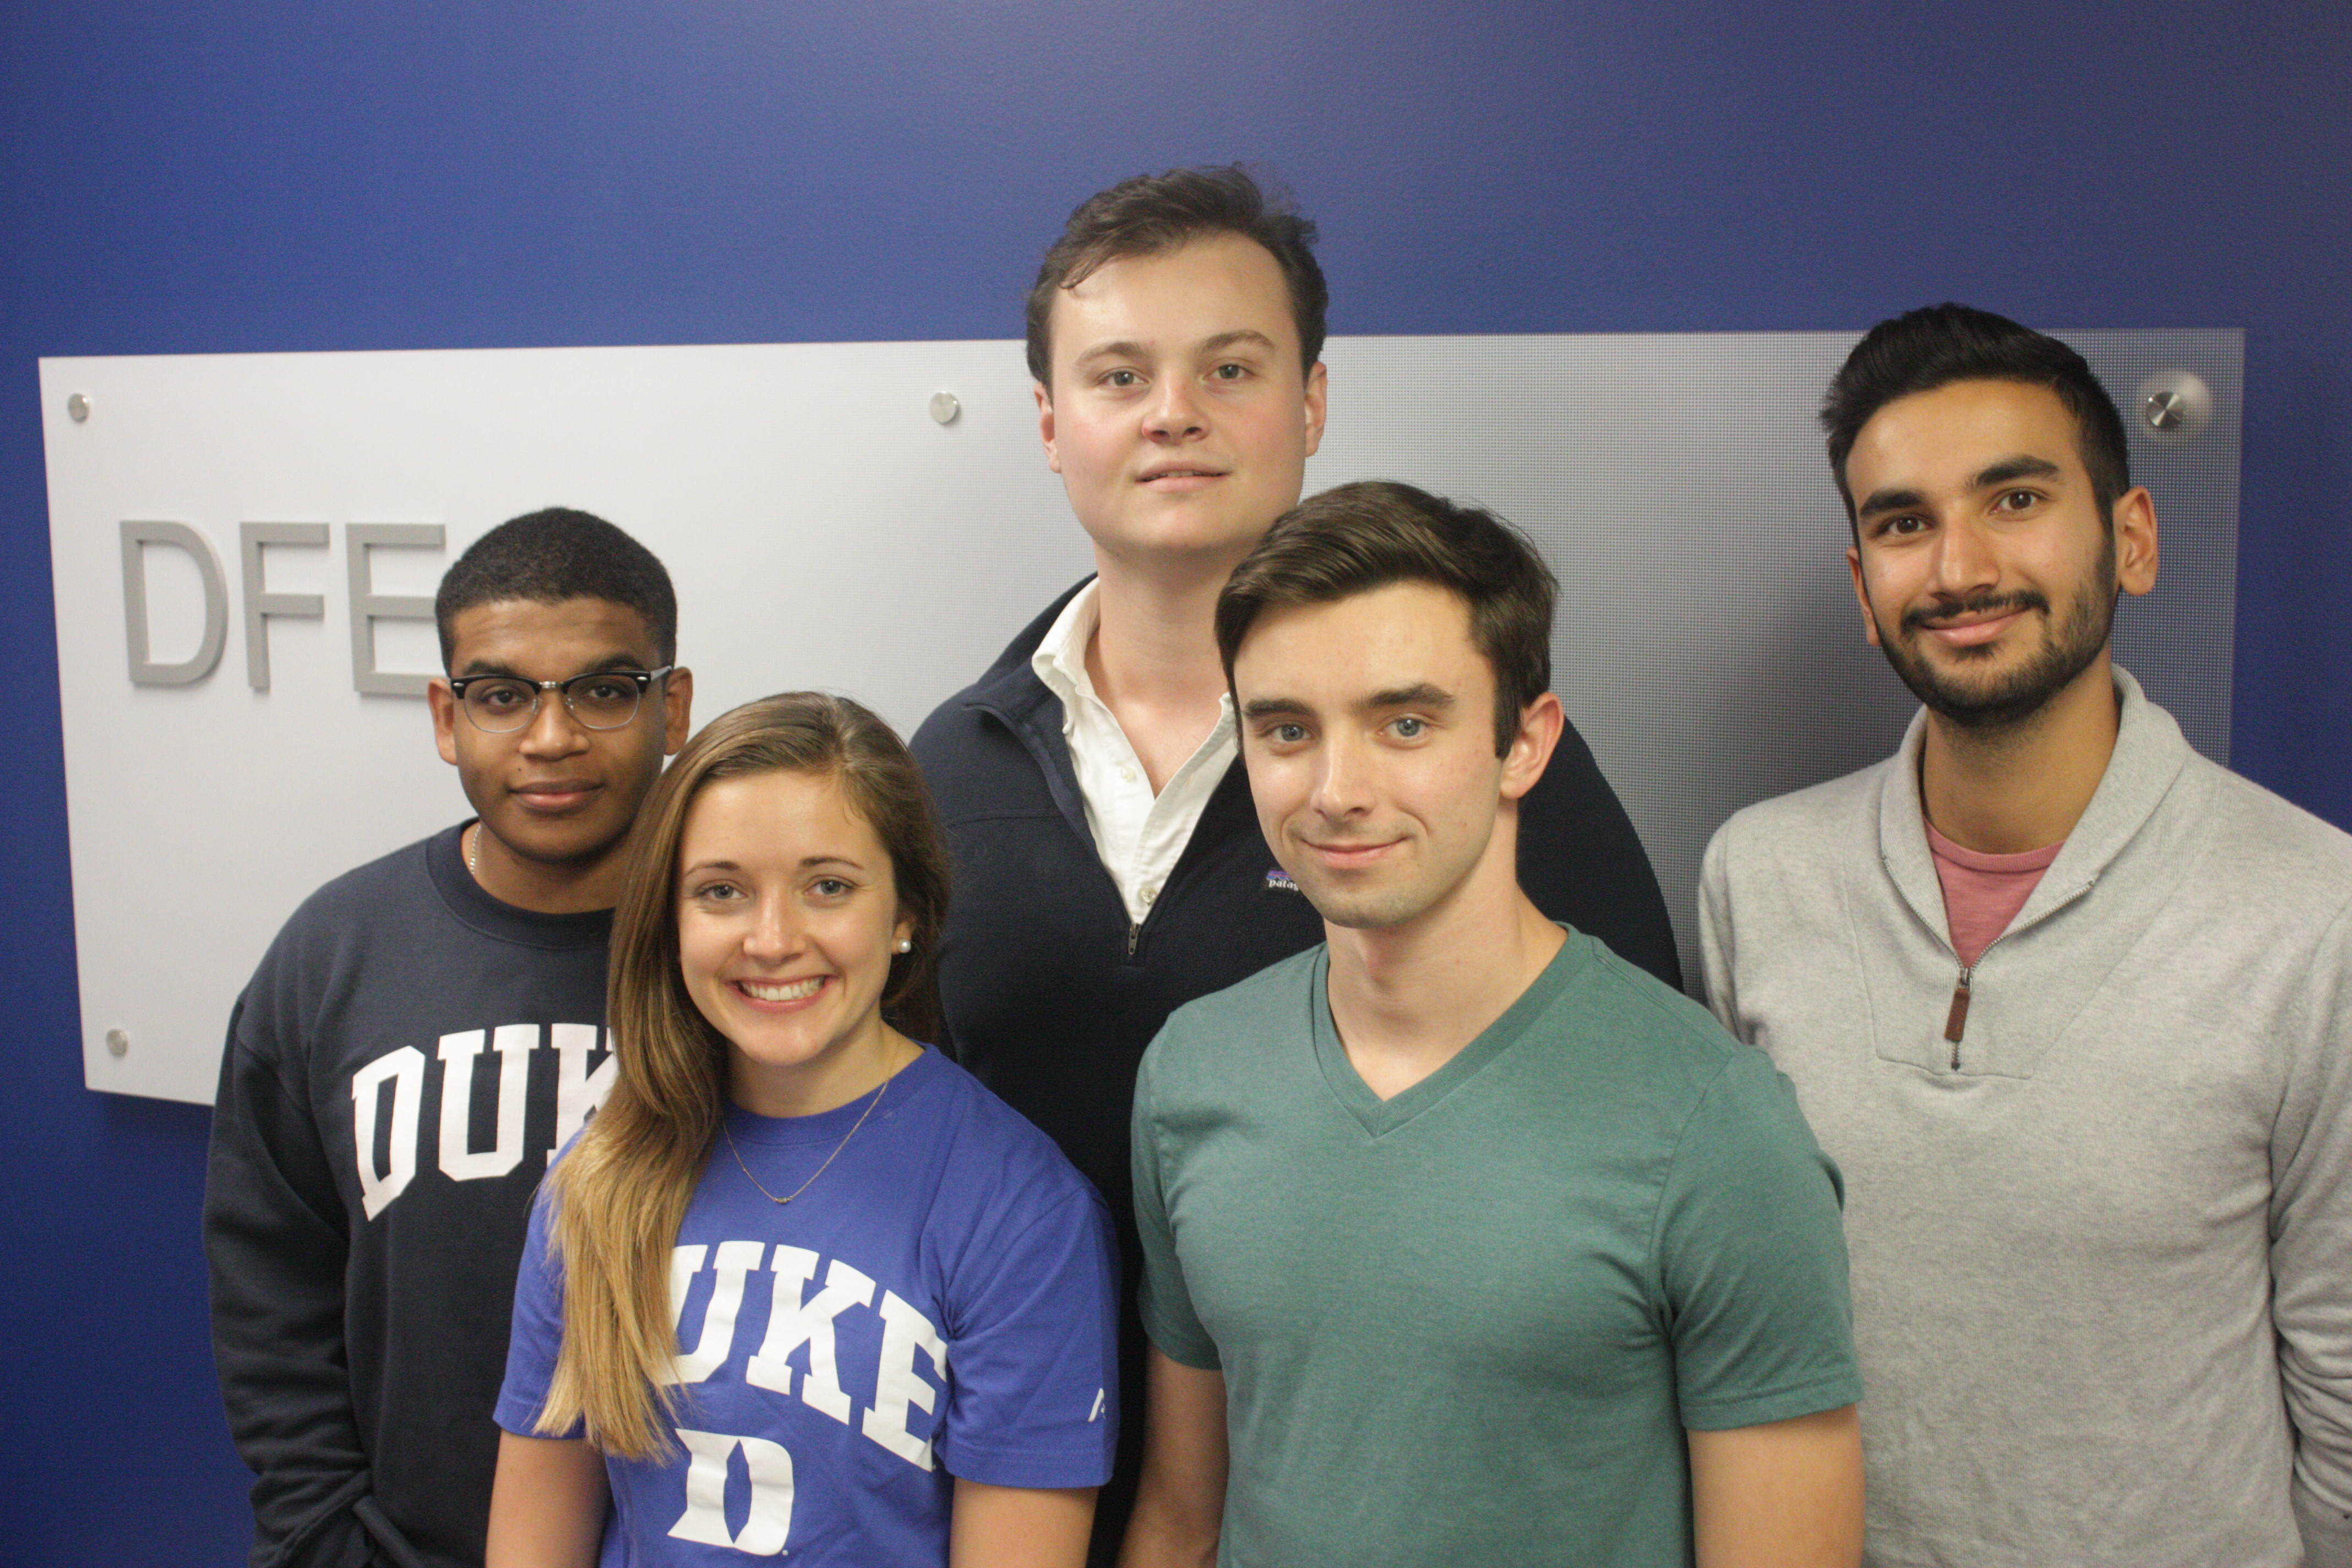 DFE Student Advisory Committee 2018-19: from left, Karl Harrison, Abby Sparrow, Tassilo Corsi, Nick Hibshman, Karam Katariya